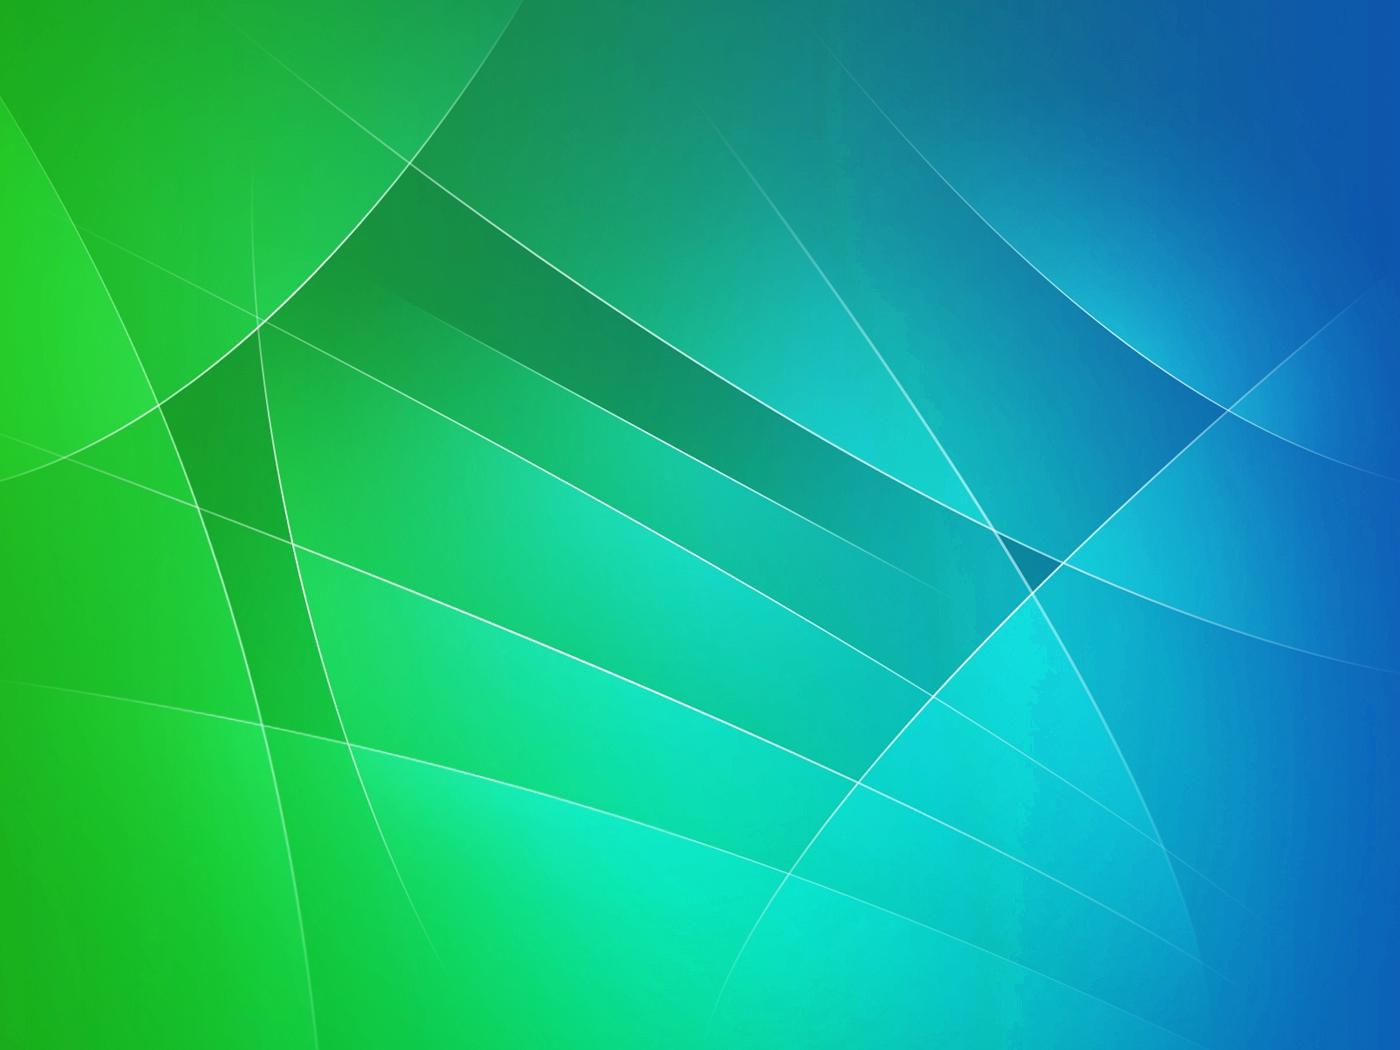 green blue white wallpaper - photo #25